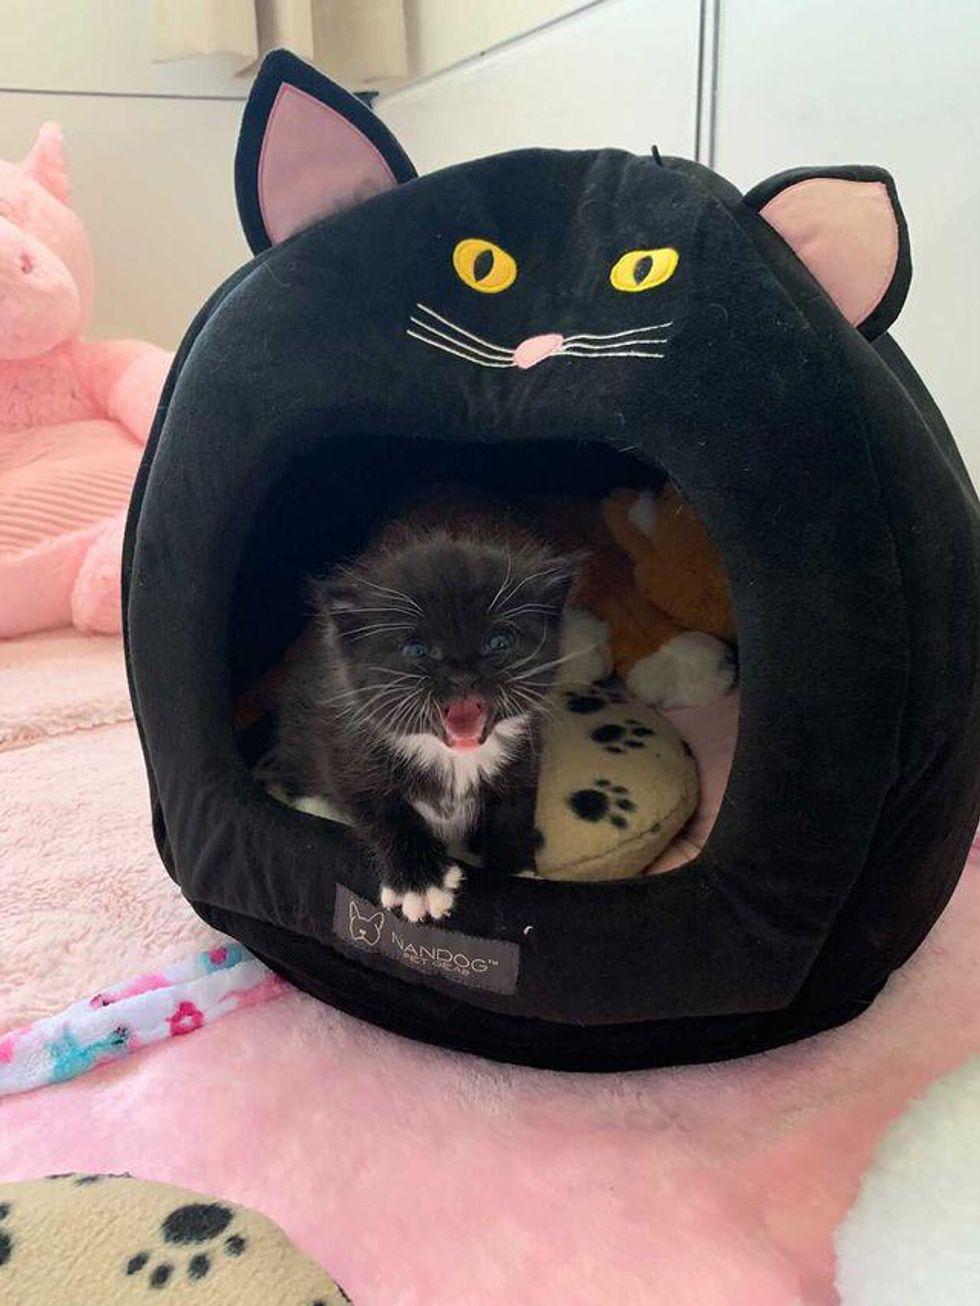 Tuxedo kitten, talking cat, princess peeping